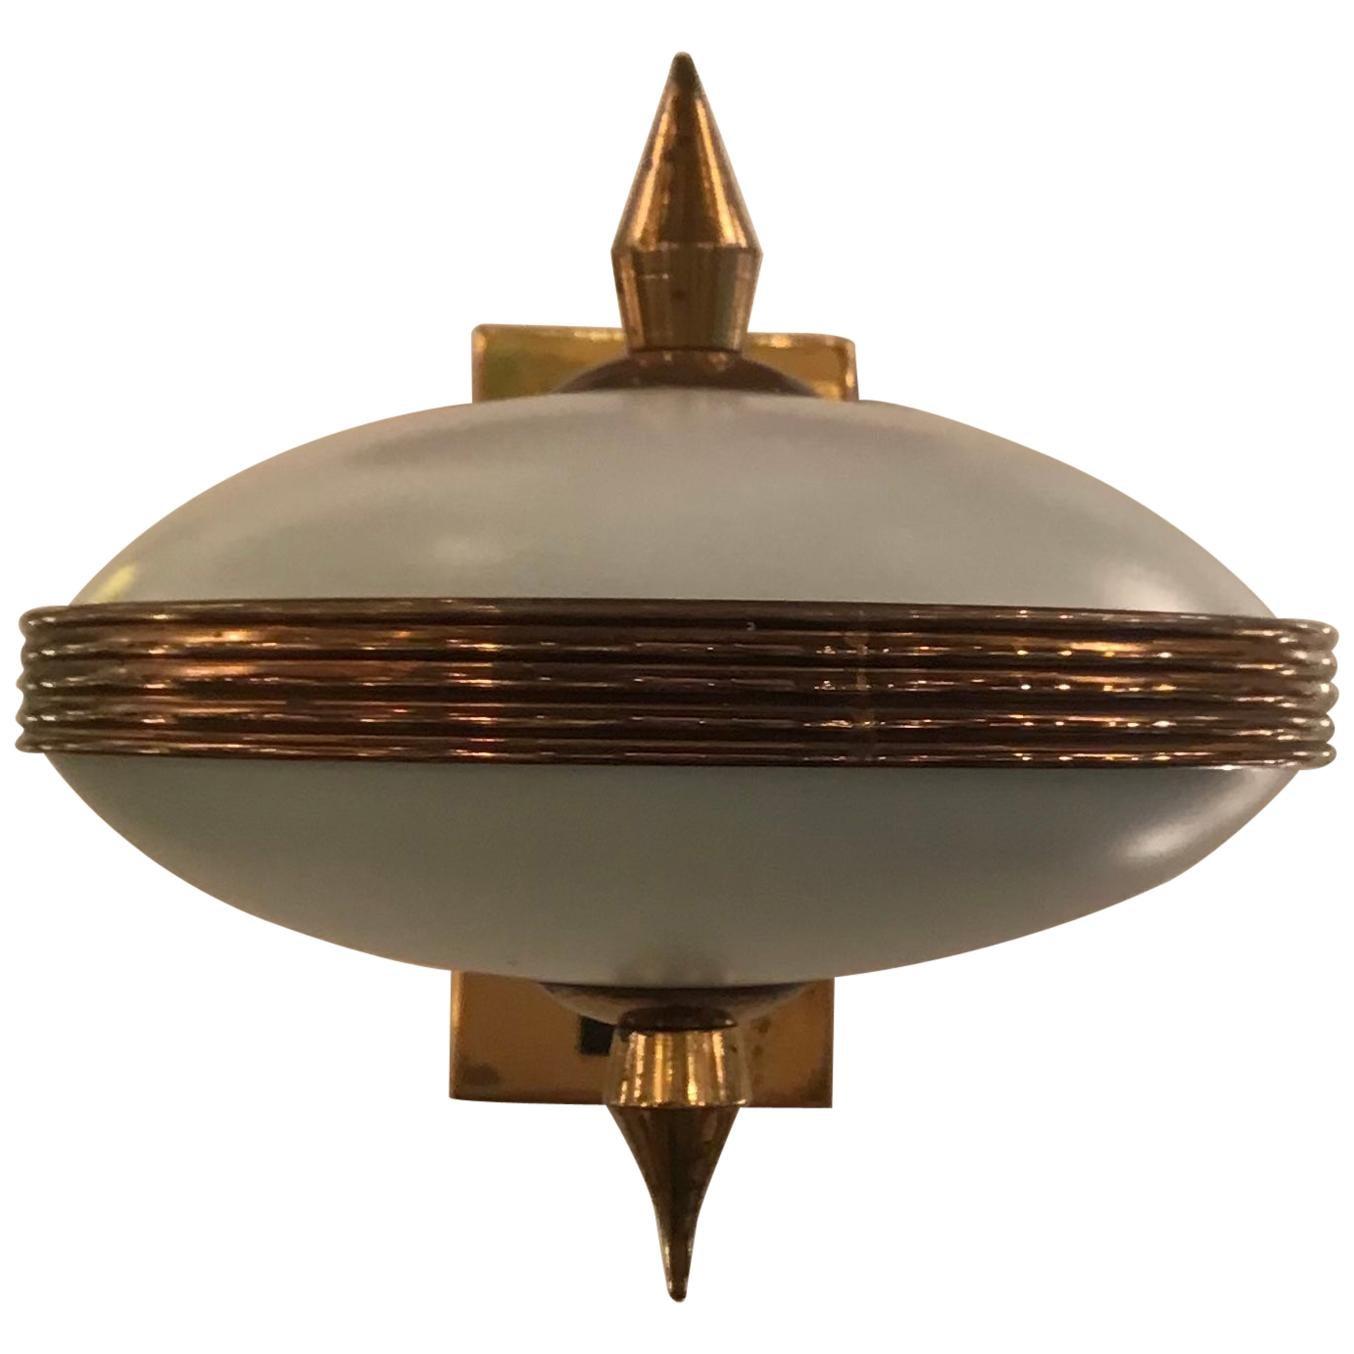 Stilnovo Style Sconces Brass Opaline Glass Iron, 1950, Italy